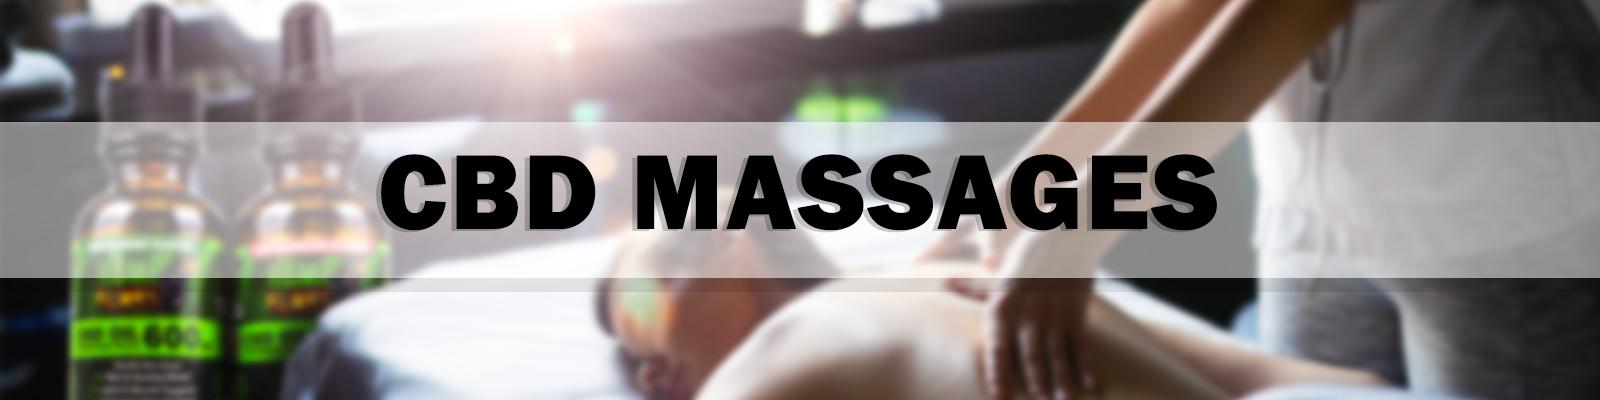 What is a CBD Massage